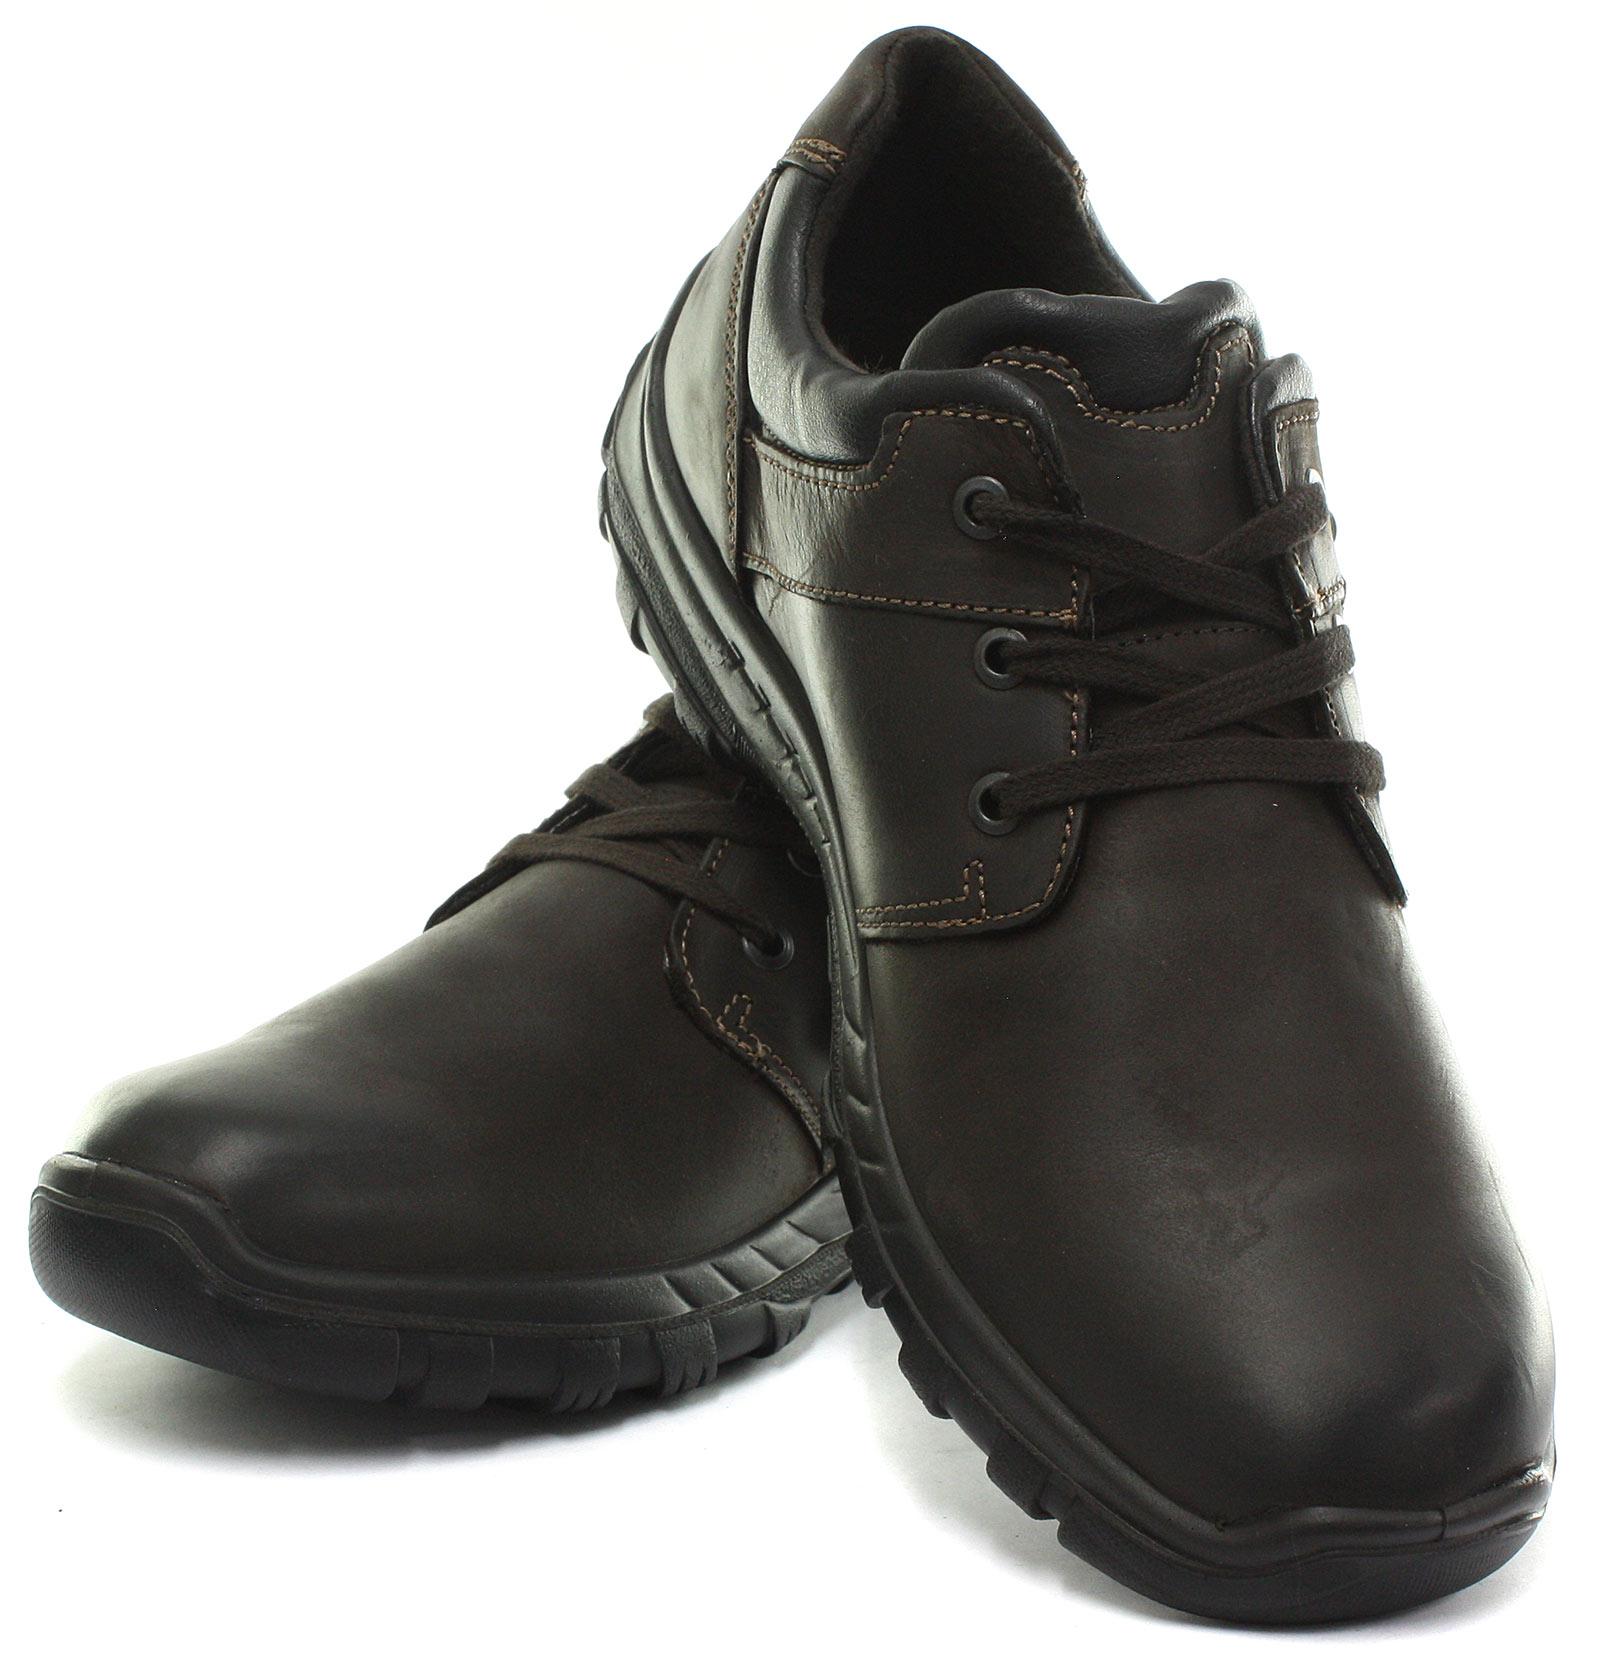 ImacTex-Mens-3-Eye-Leisure-Water-Resistant-Walking-Shoes-ALL-SIZES miniature 2